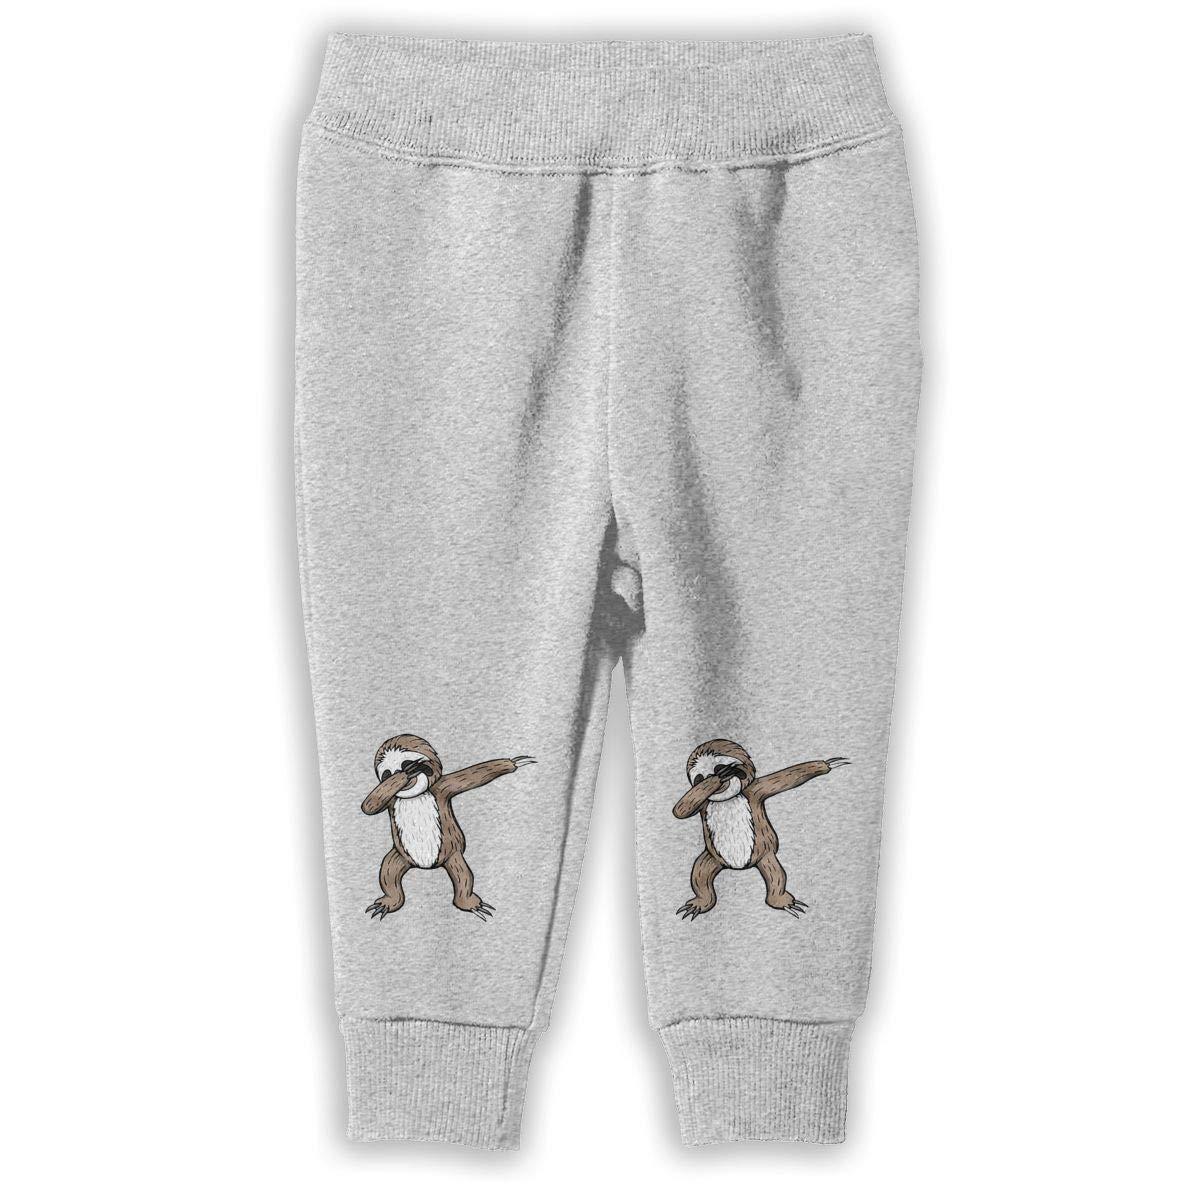 Summermf Dabbing Sloth Child Boys Girls Unisex Sports Sweatpants Kids Casual Jogger Pants